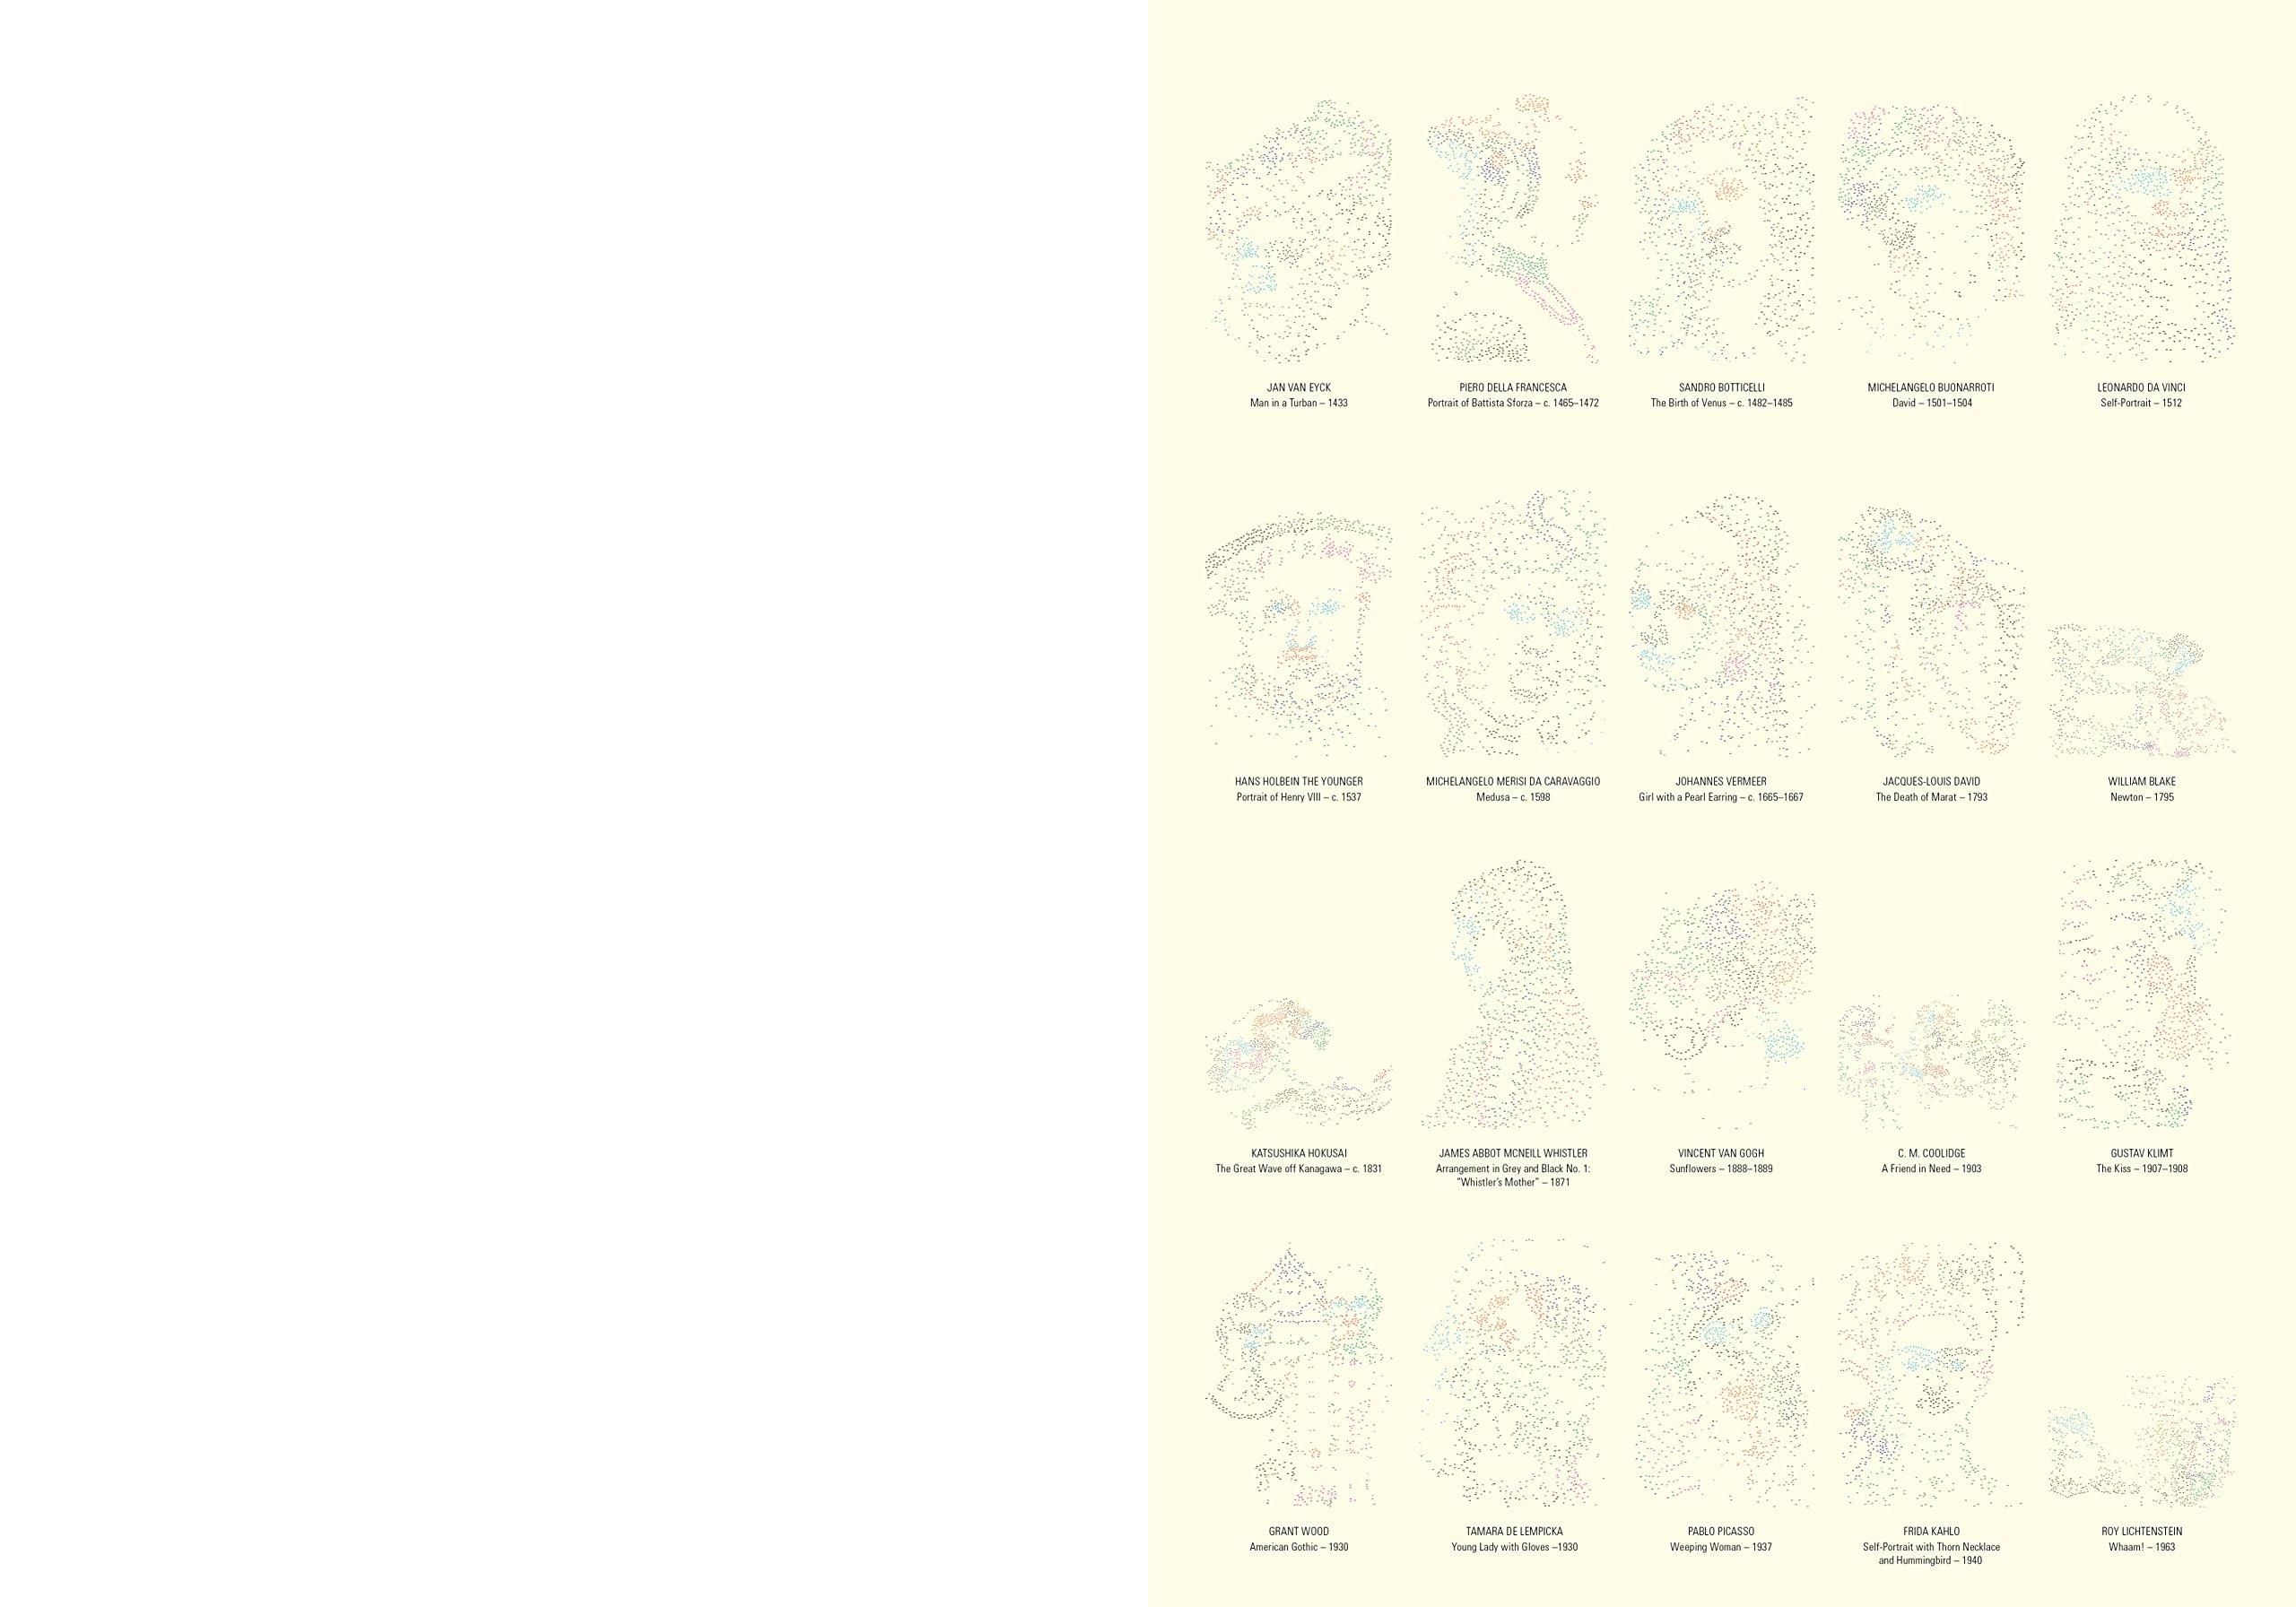 Amazon.com: The 1000 Dot-To-Dot Book: Masterpieces (Ilex Art &  Illustration) (9781781572054): Thomas Pavitte: Books